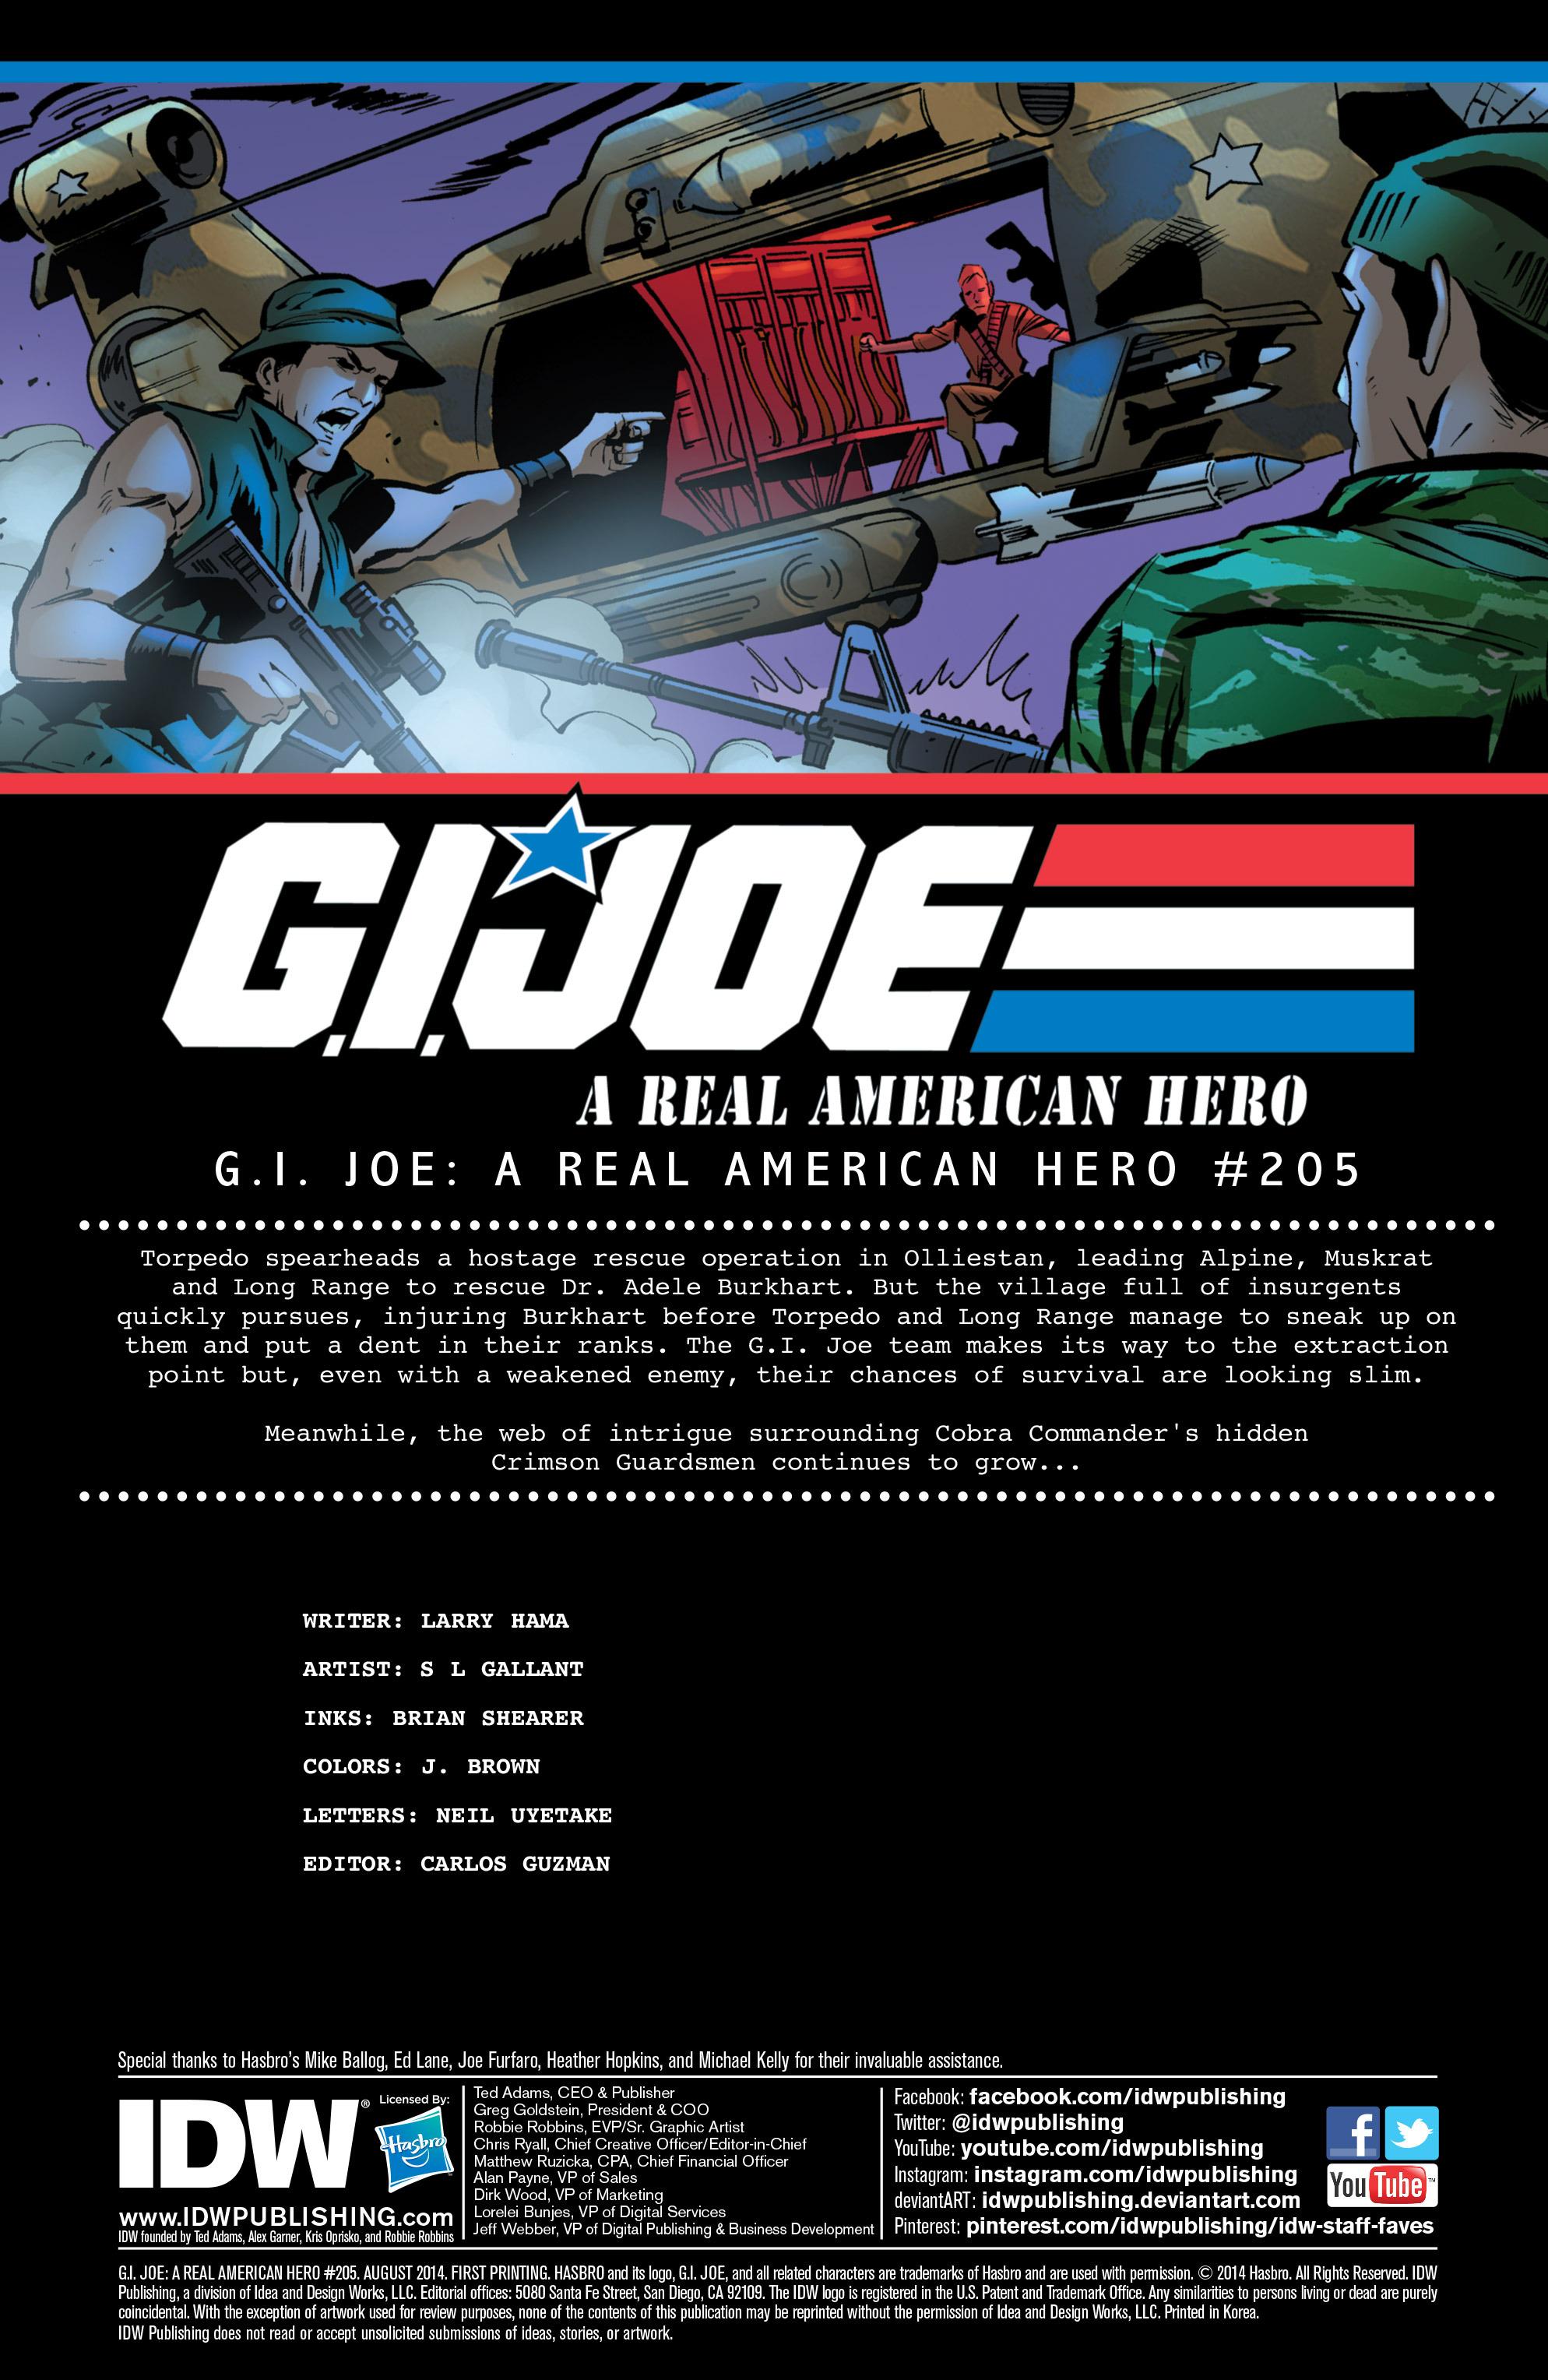 G.I. Joe: A Real American Hero 205 Page 2